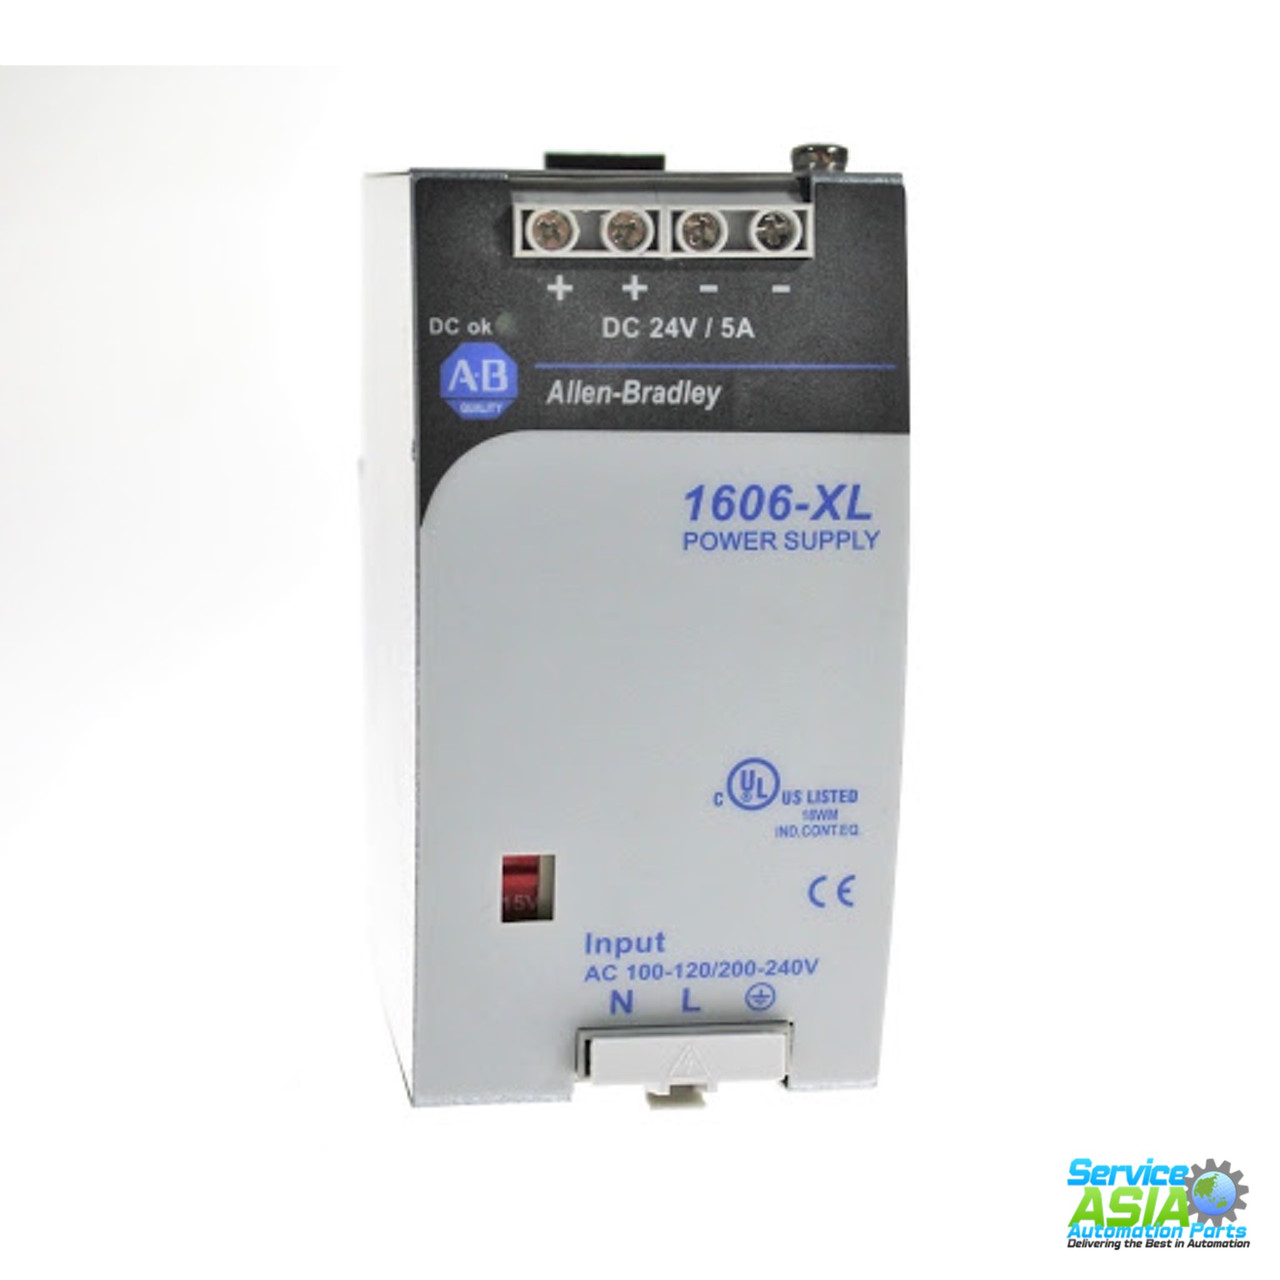 AB  1606-XL120DR INPUT AC100-240  OUTPUT 24VDC 120 WATT POWER SUPPLY